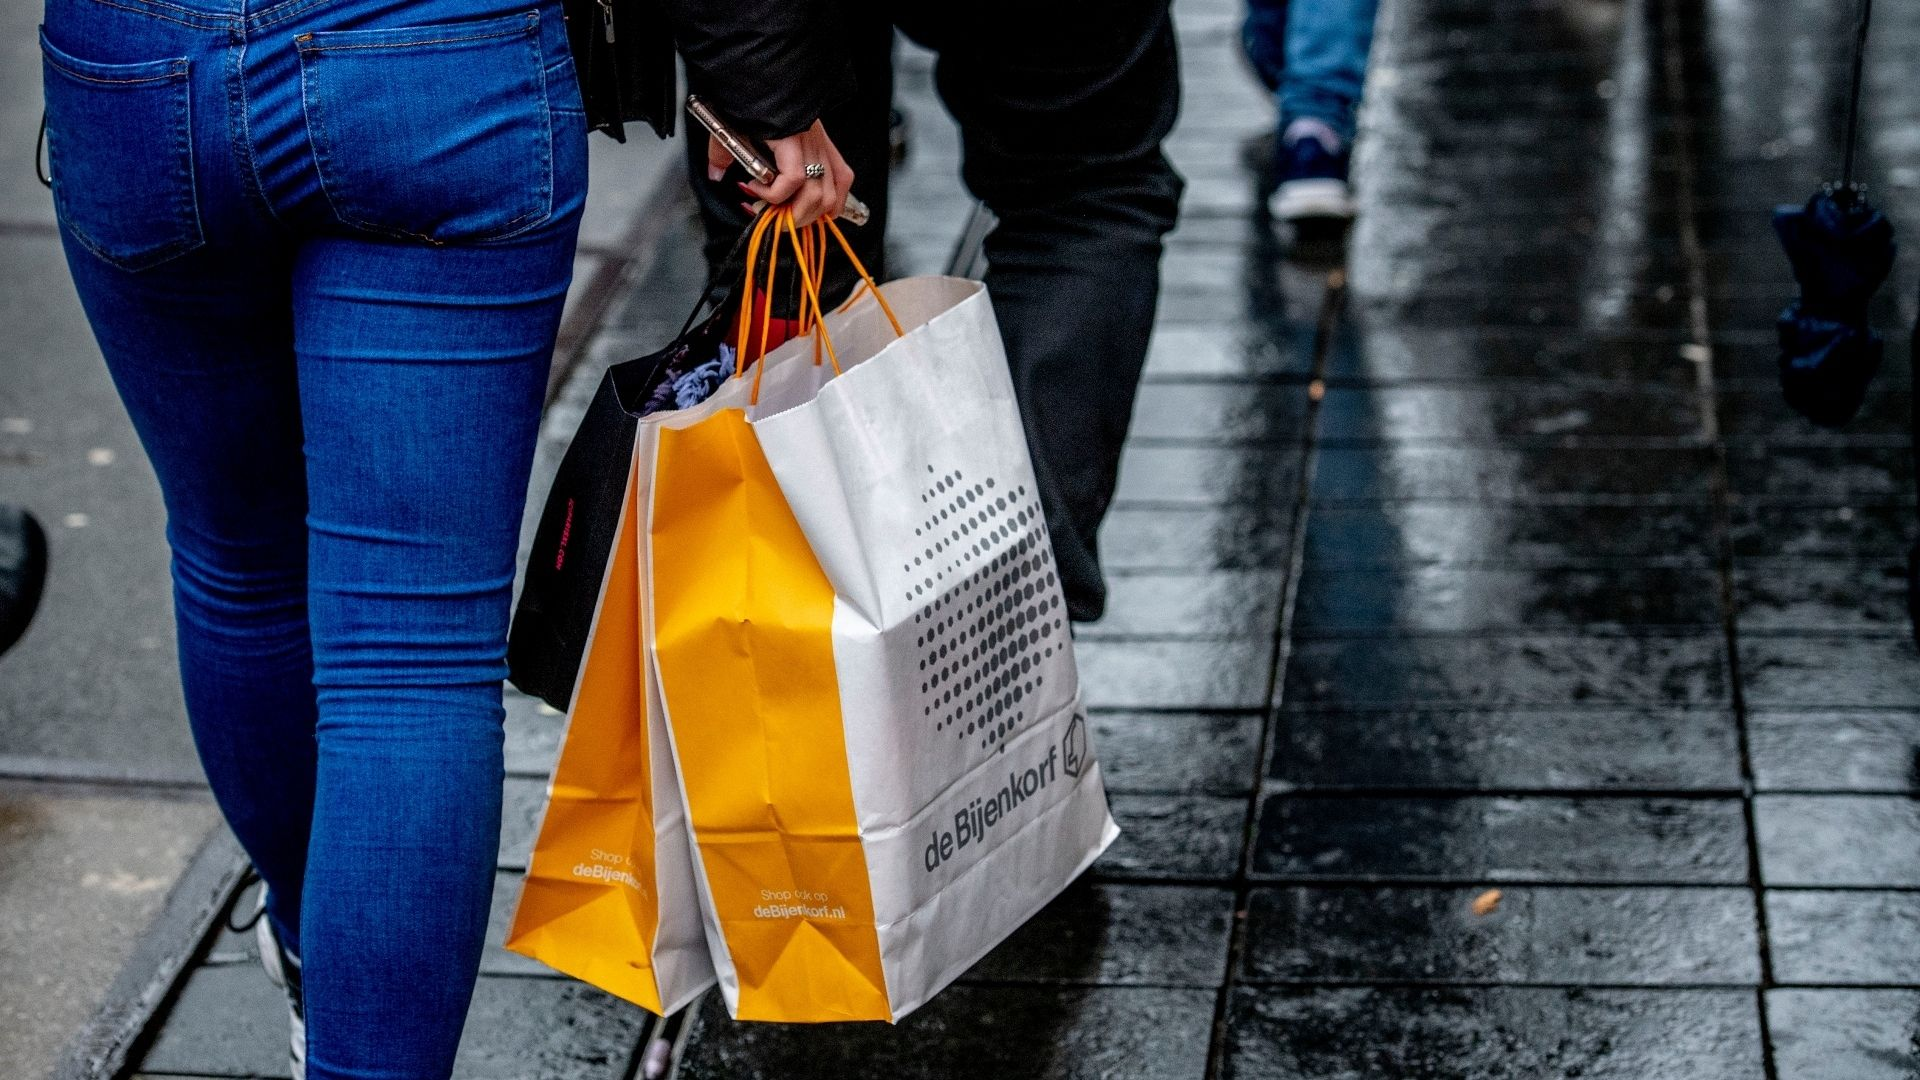 Cbs koopkracht shoppen